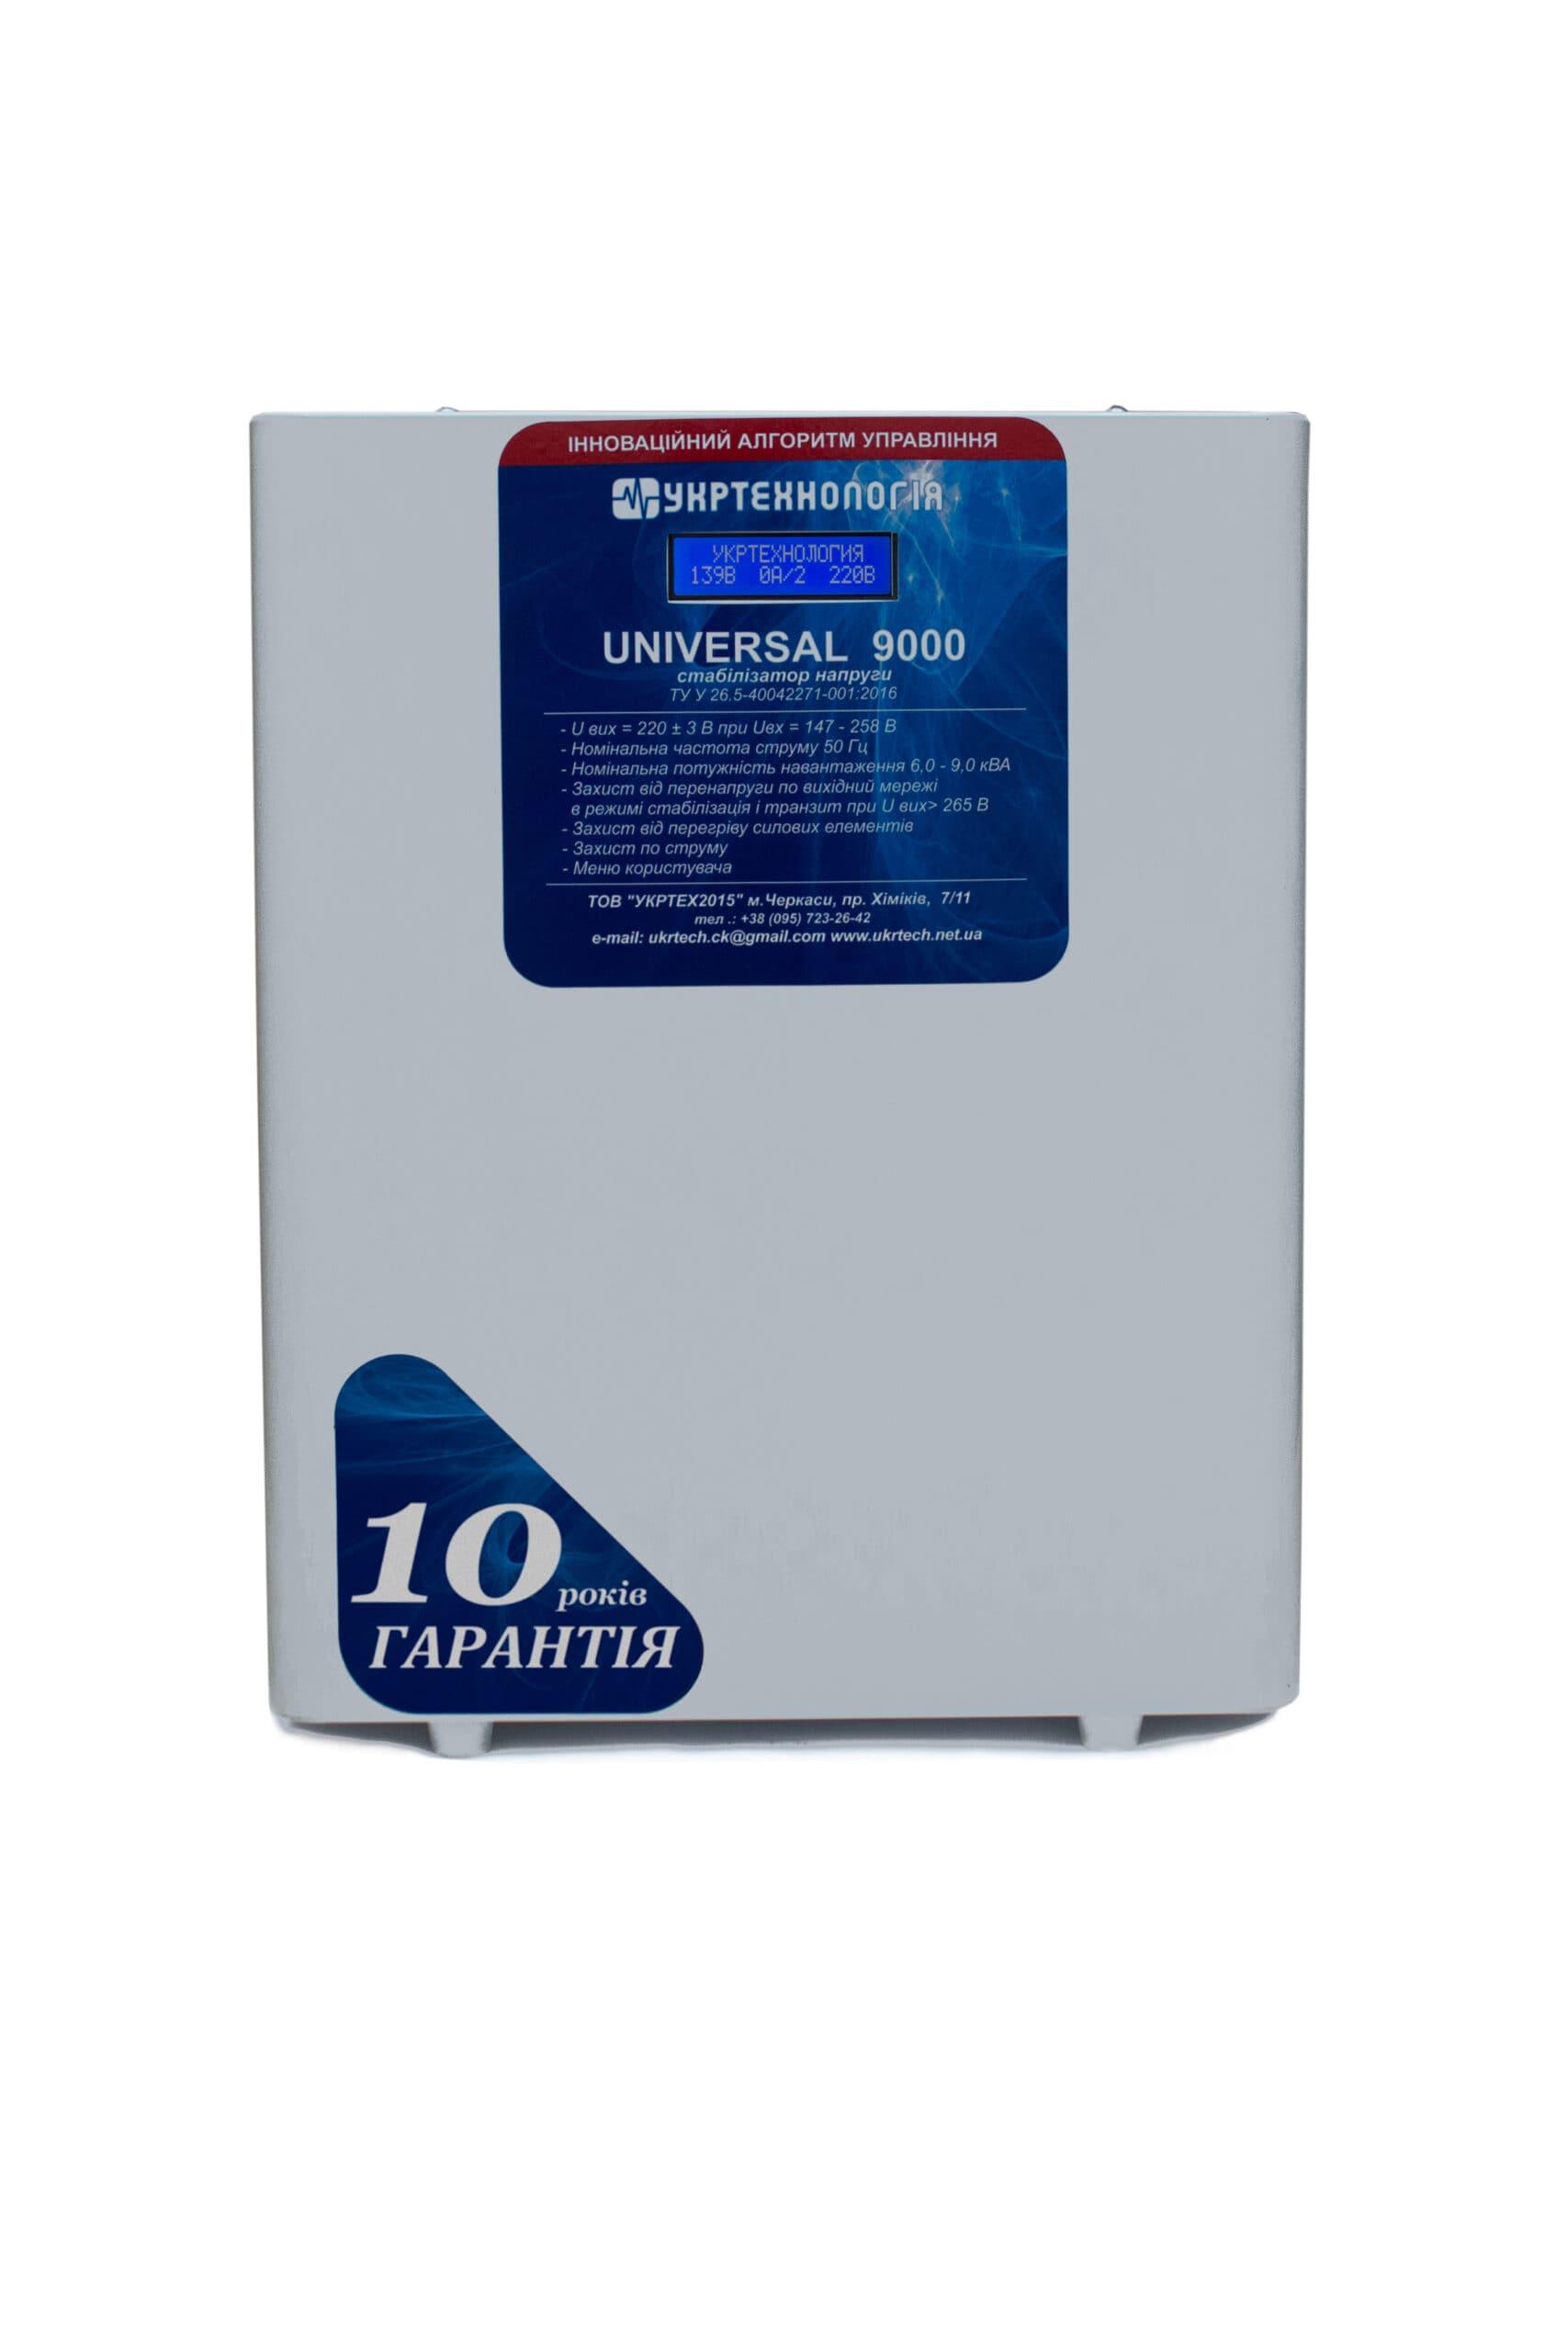 Стабилизаторы напряжения - Стабилизатор напряжения 9 кВт UNIVERSAL 000001419 - Фото 2